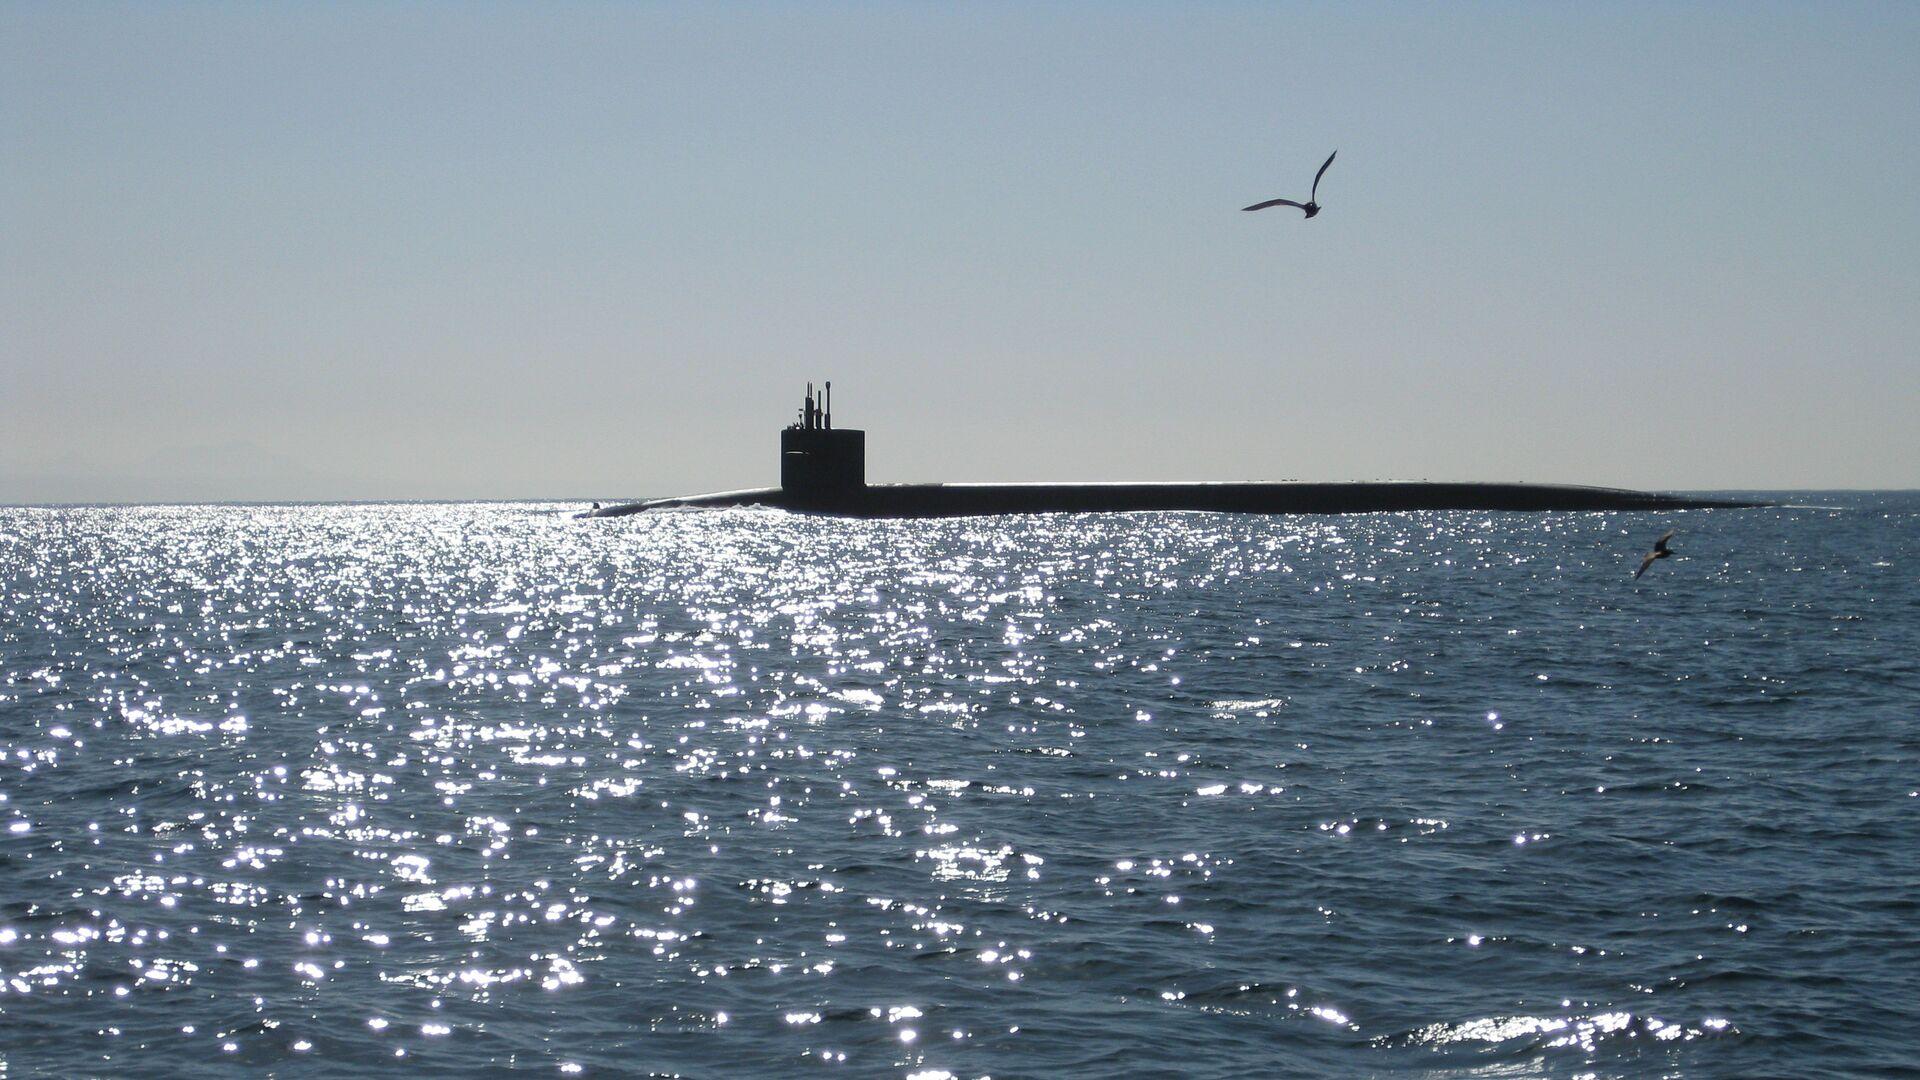 Un submarino (imagen referencial) - Sputnik Mundo, 1920, 17.03.2021